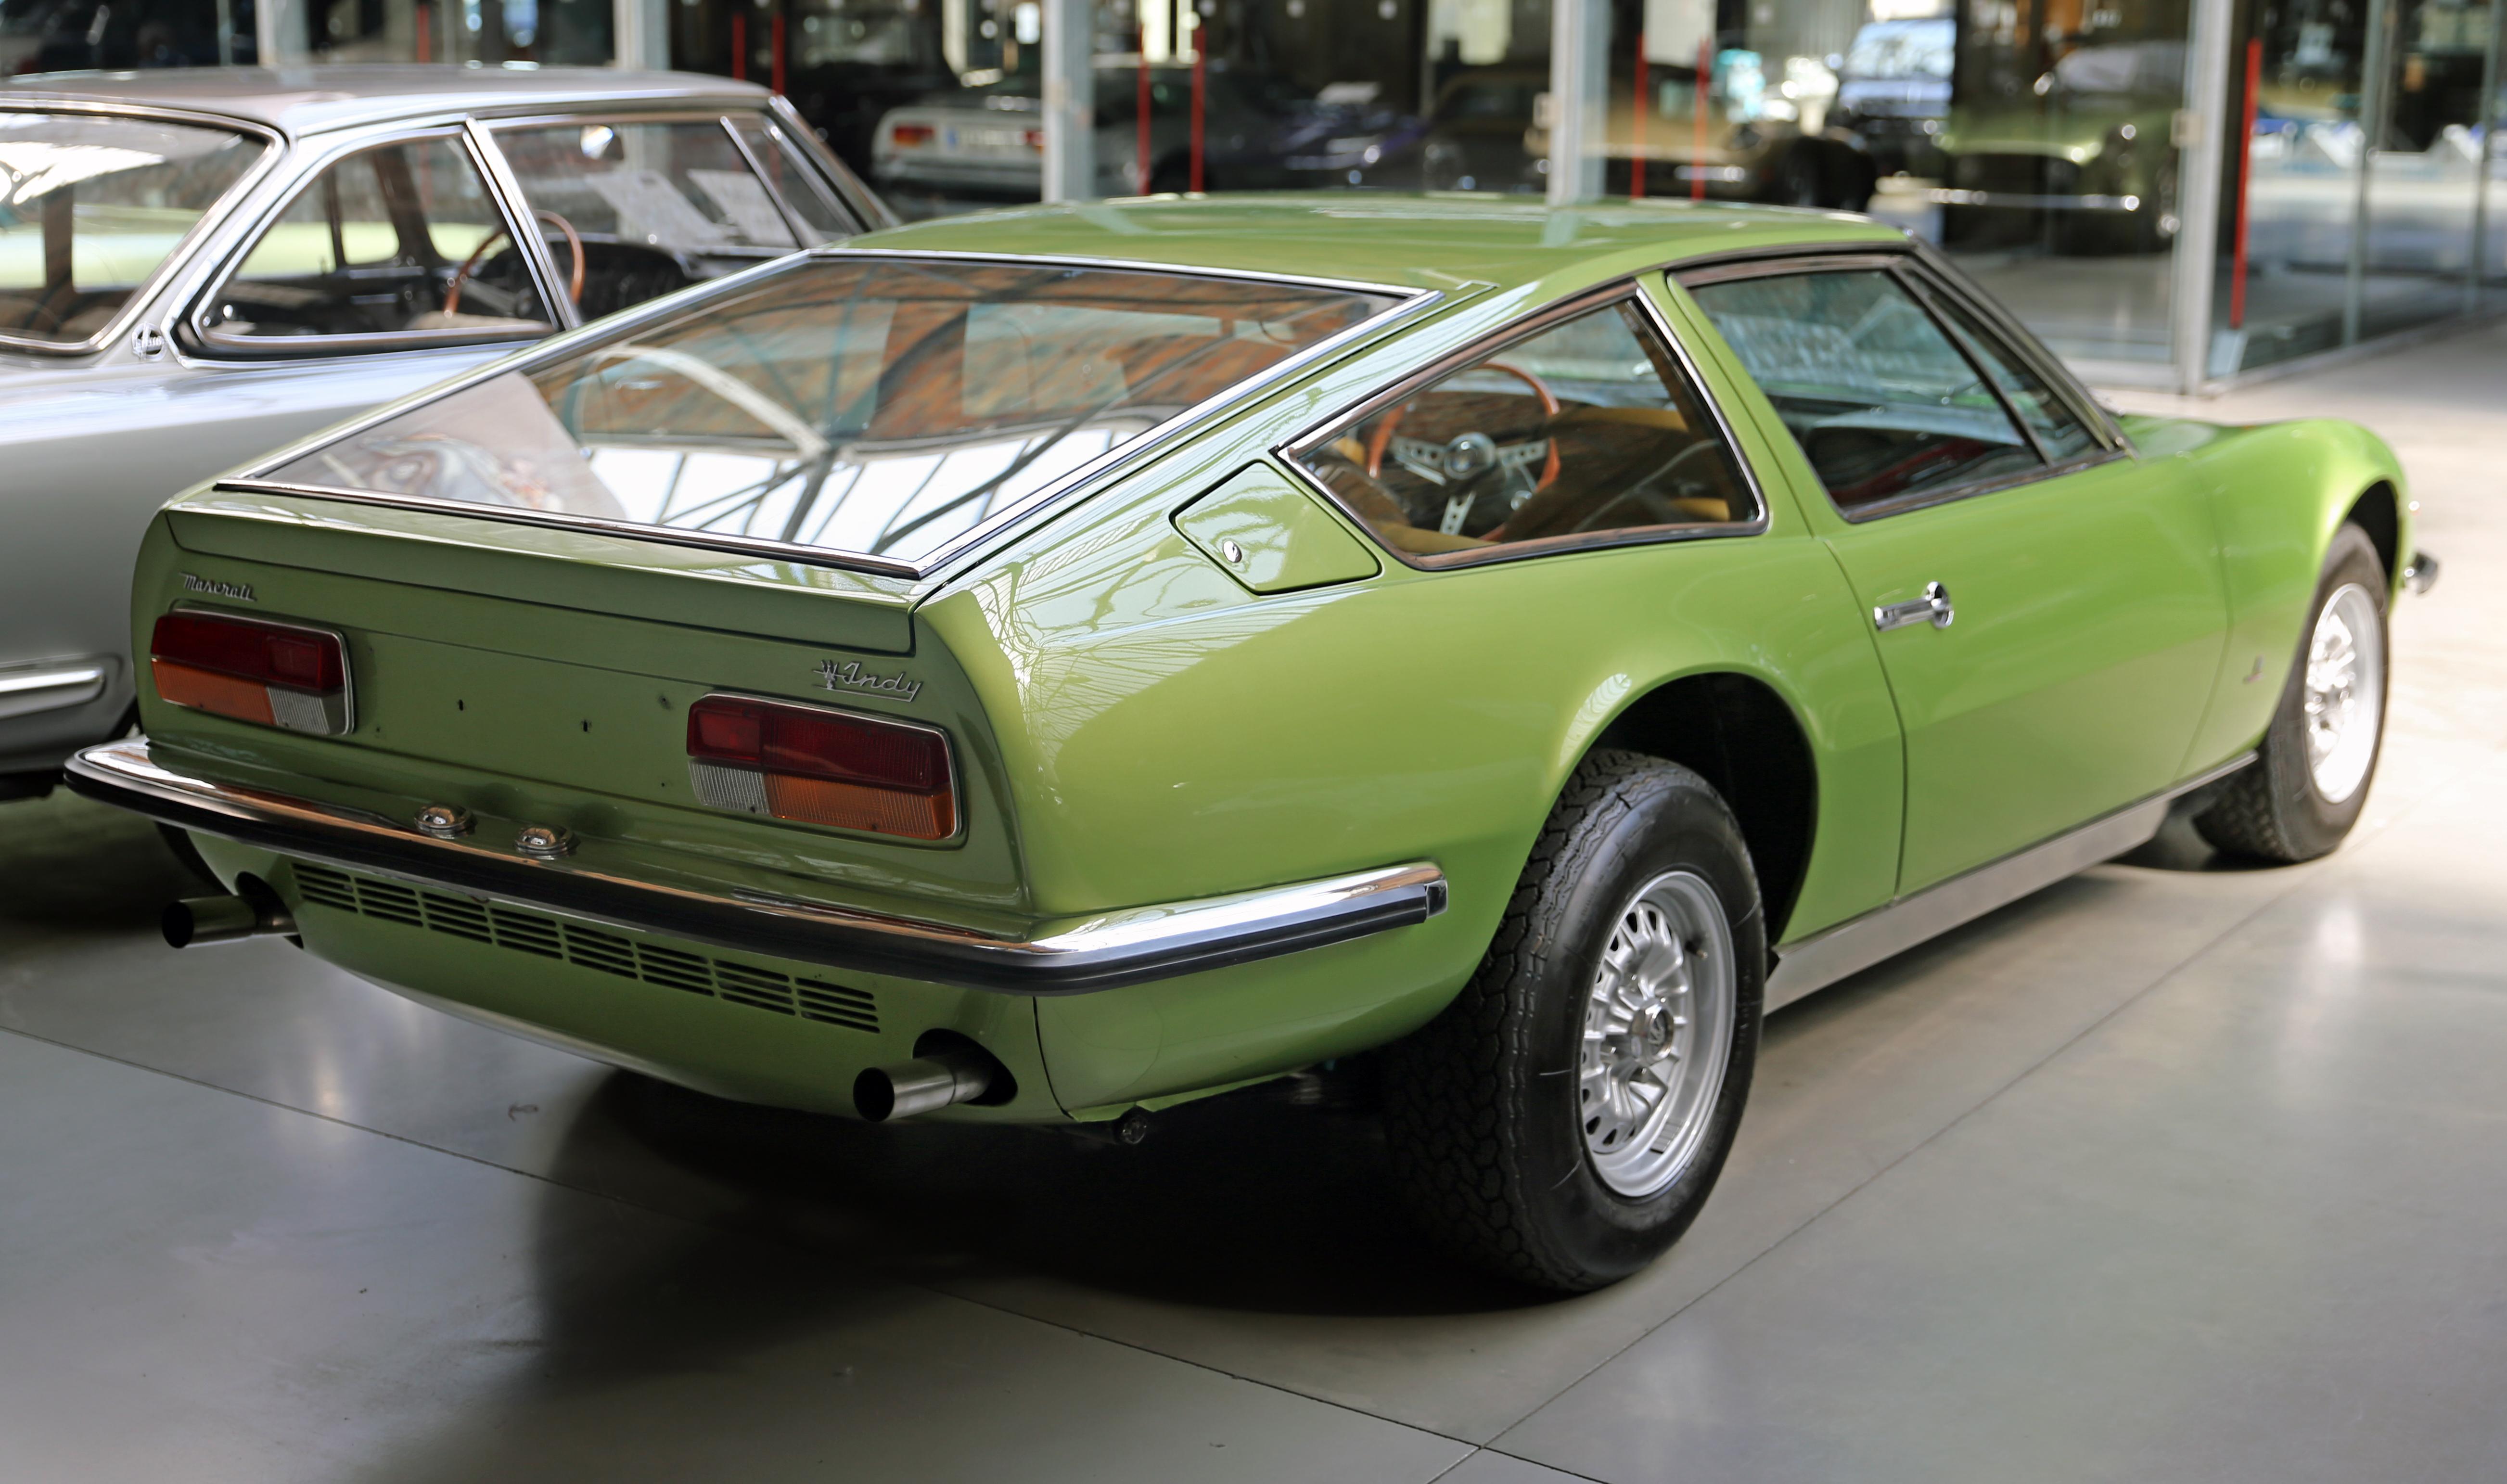 file:1970 maserati indy 4200 rear right, thiesen - wikimedia